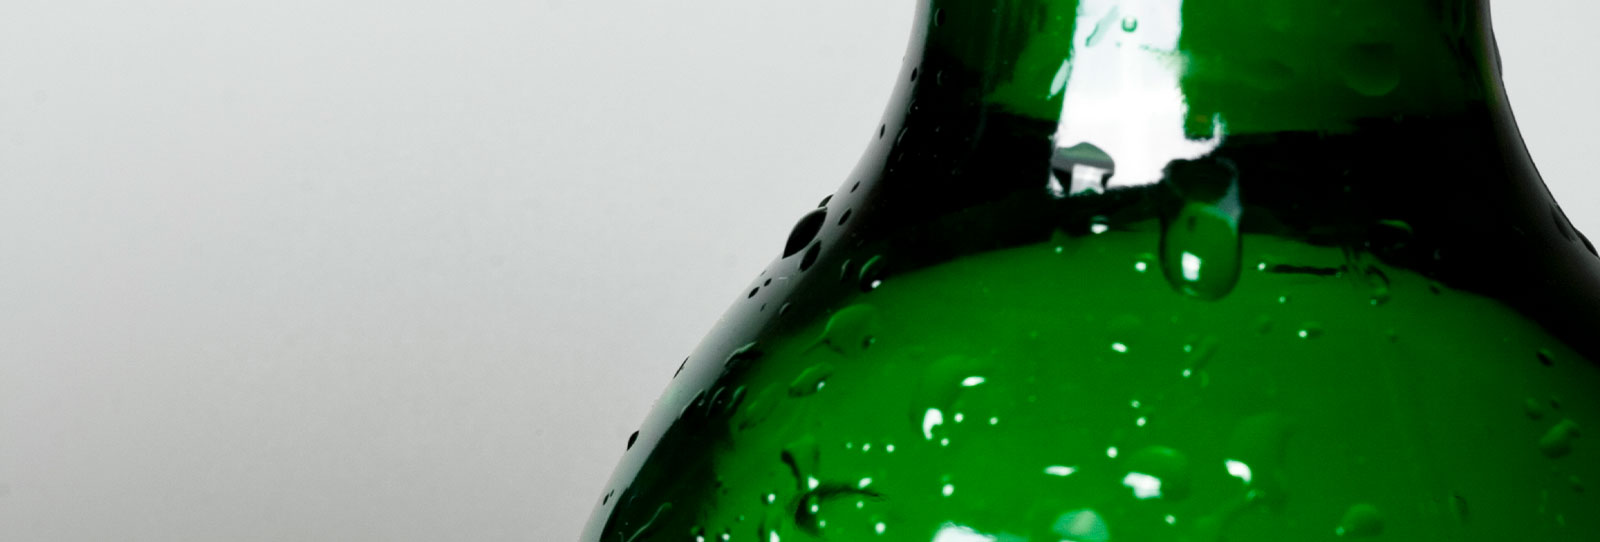 enfriar vinos de Galicia